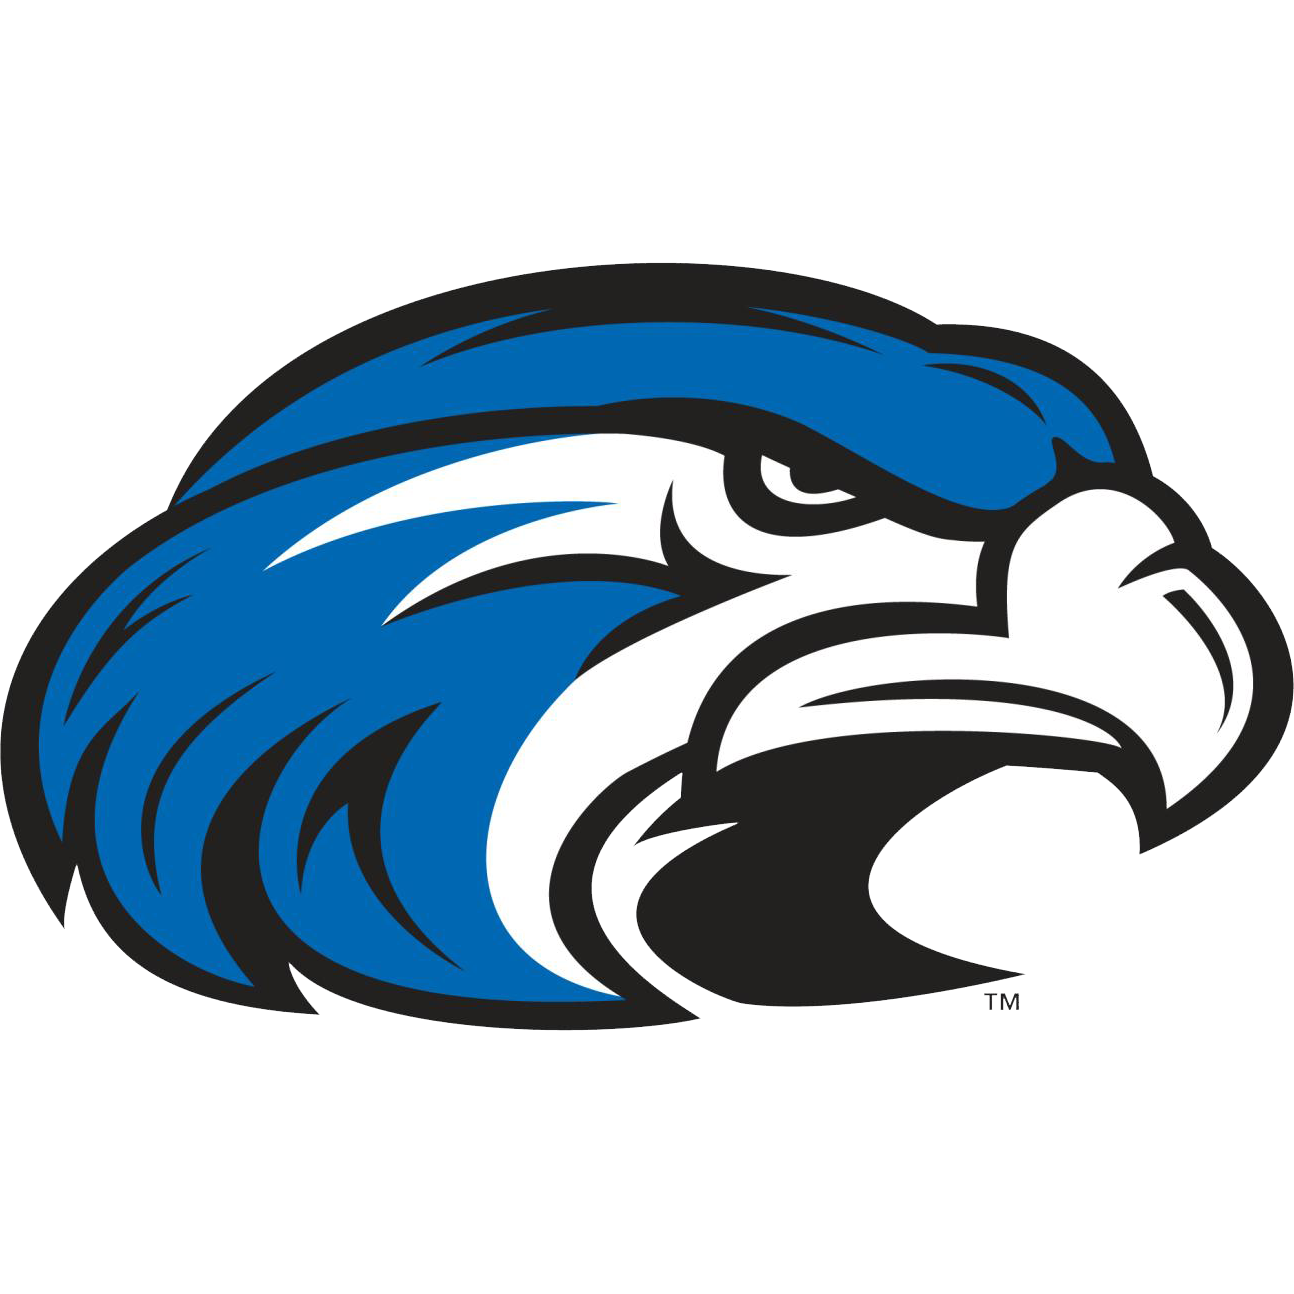 Hawk clipart shorter university, Hawk shorter university.